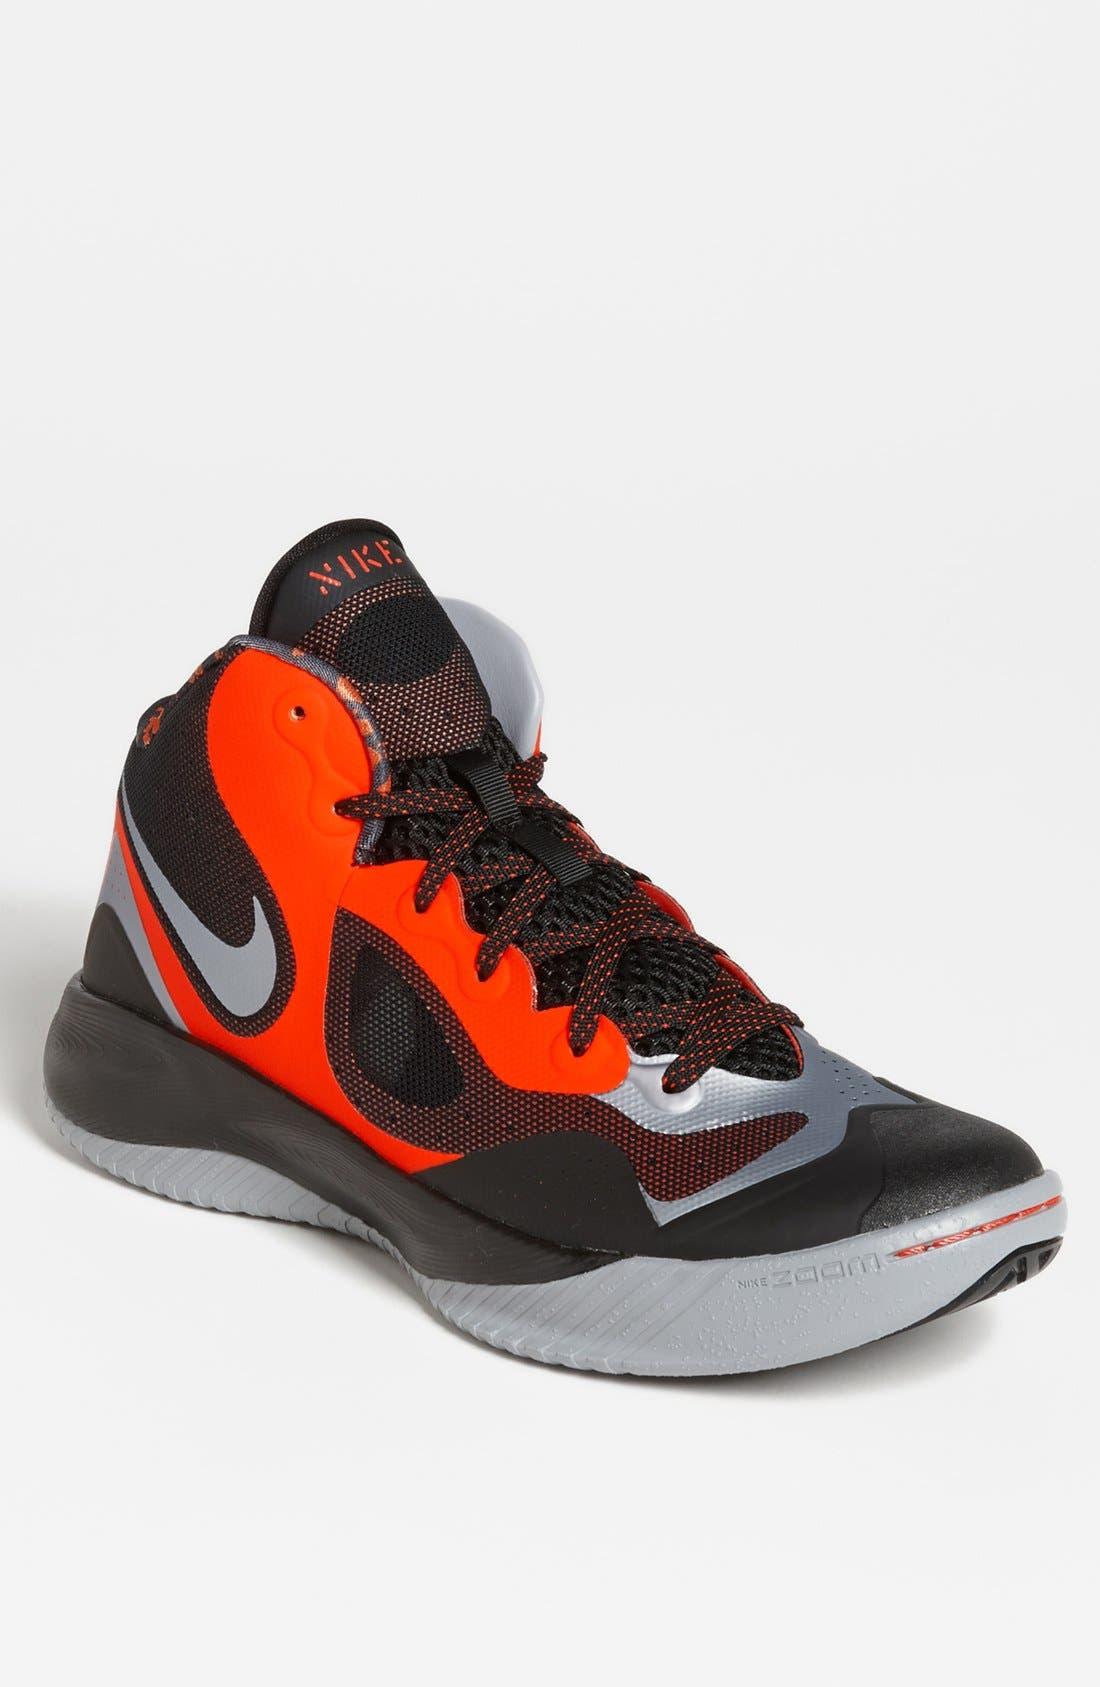 Alternate Image 1 Selected - Nike 'Zoom HyperFranchise XD' Basketball Shoe (Men)